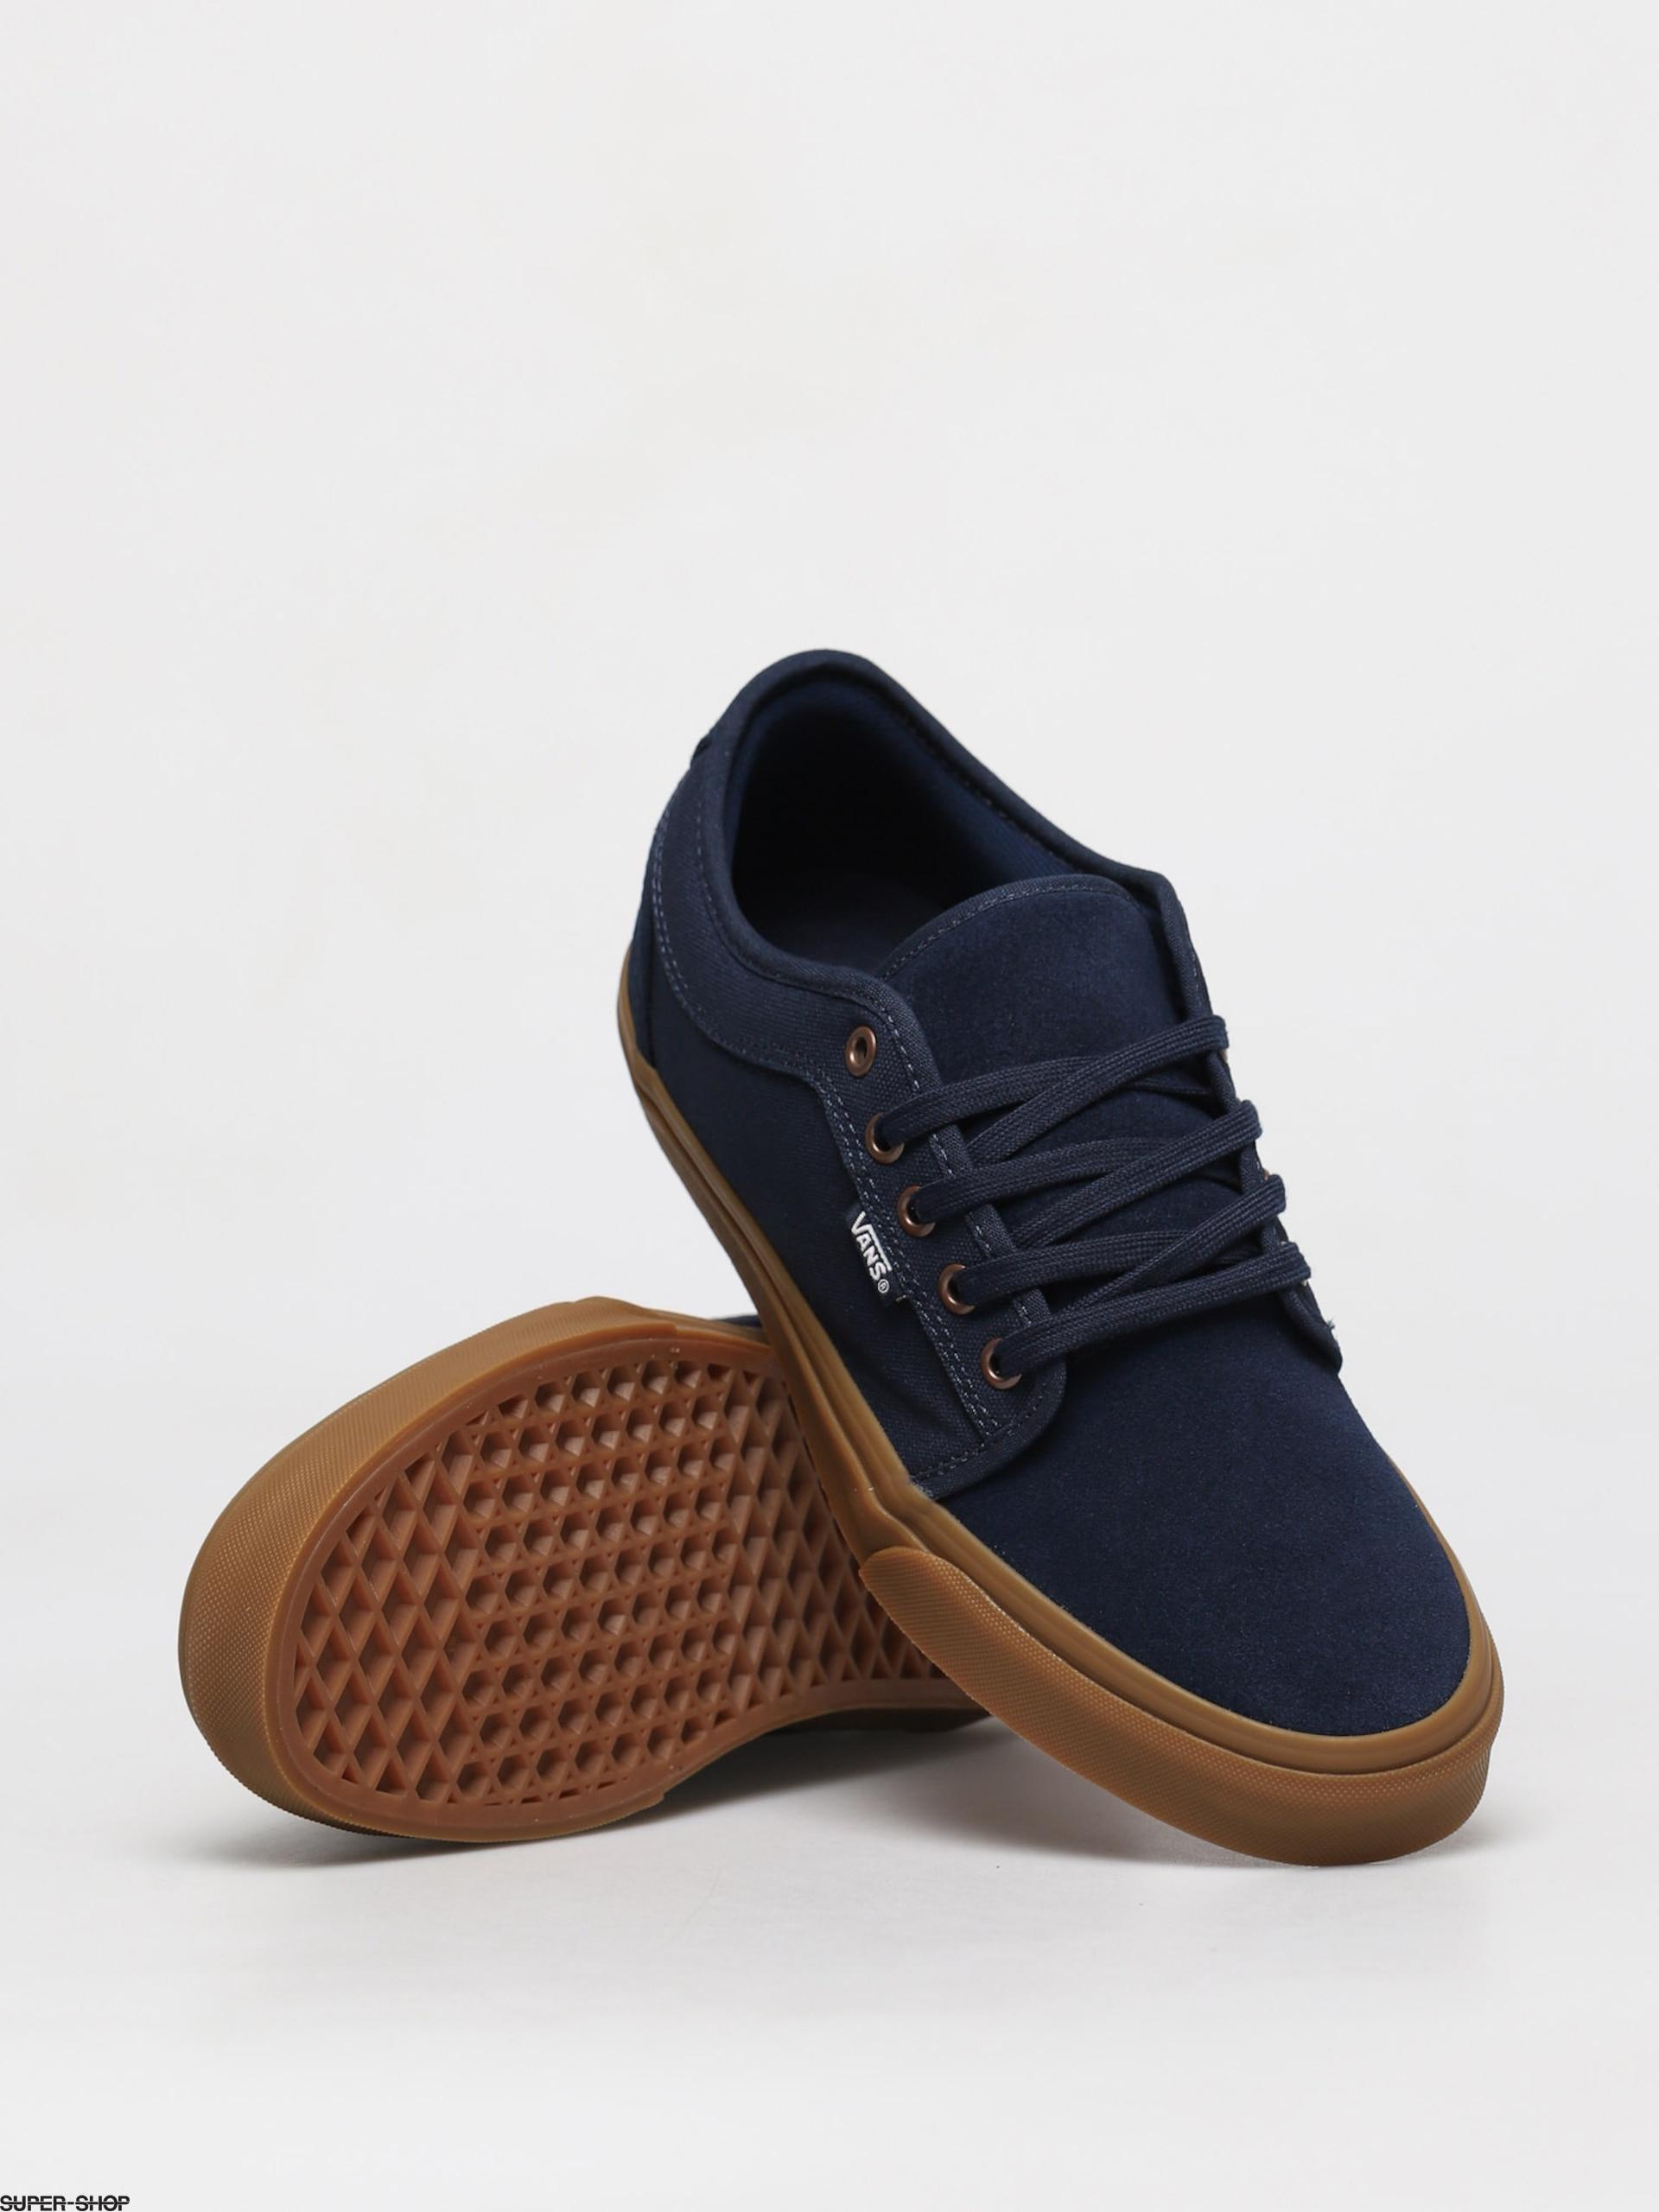 Chukka Low Shoes | Black | Vans